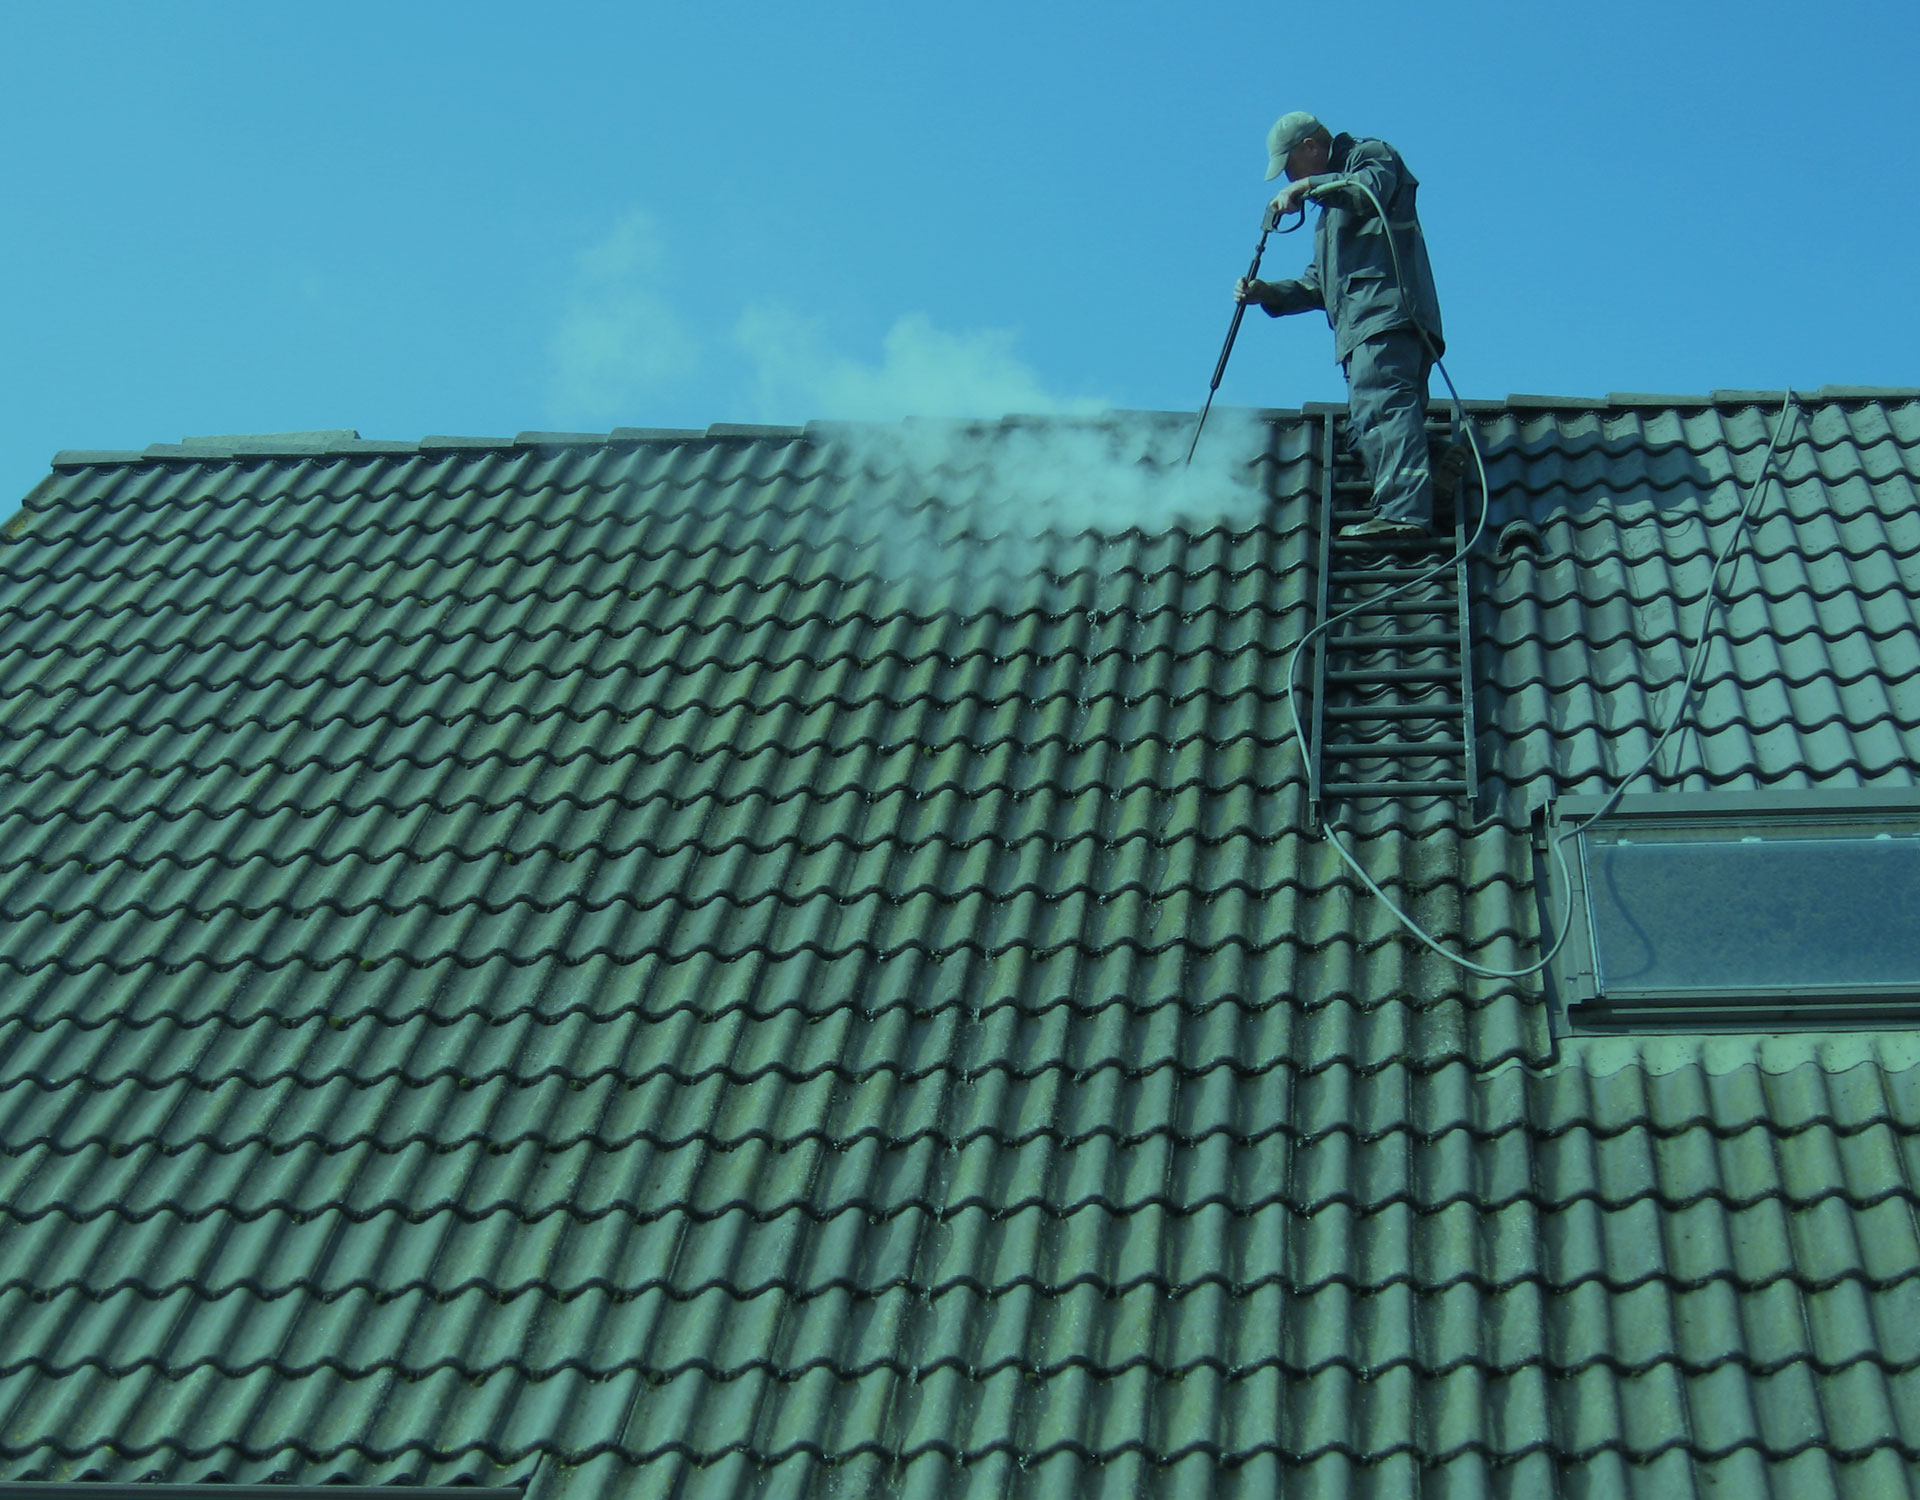 nettoyer ou d mousser votre toit mosmonster. Black Bedroom Furniture Sets. Home Design Ideas